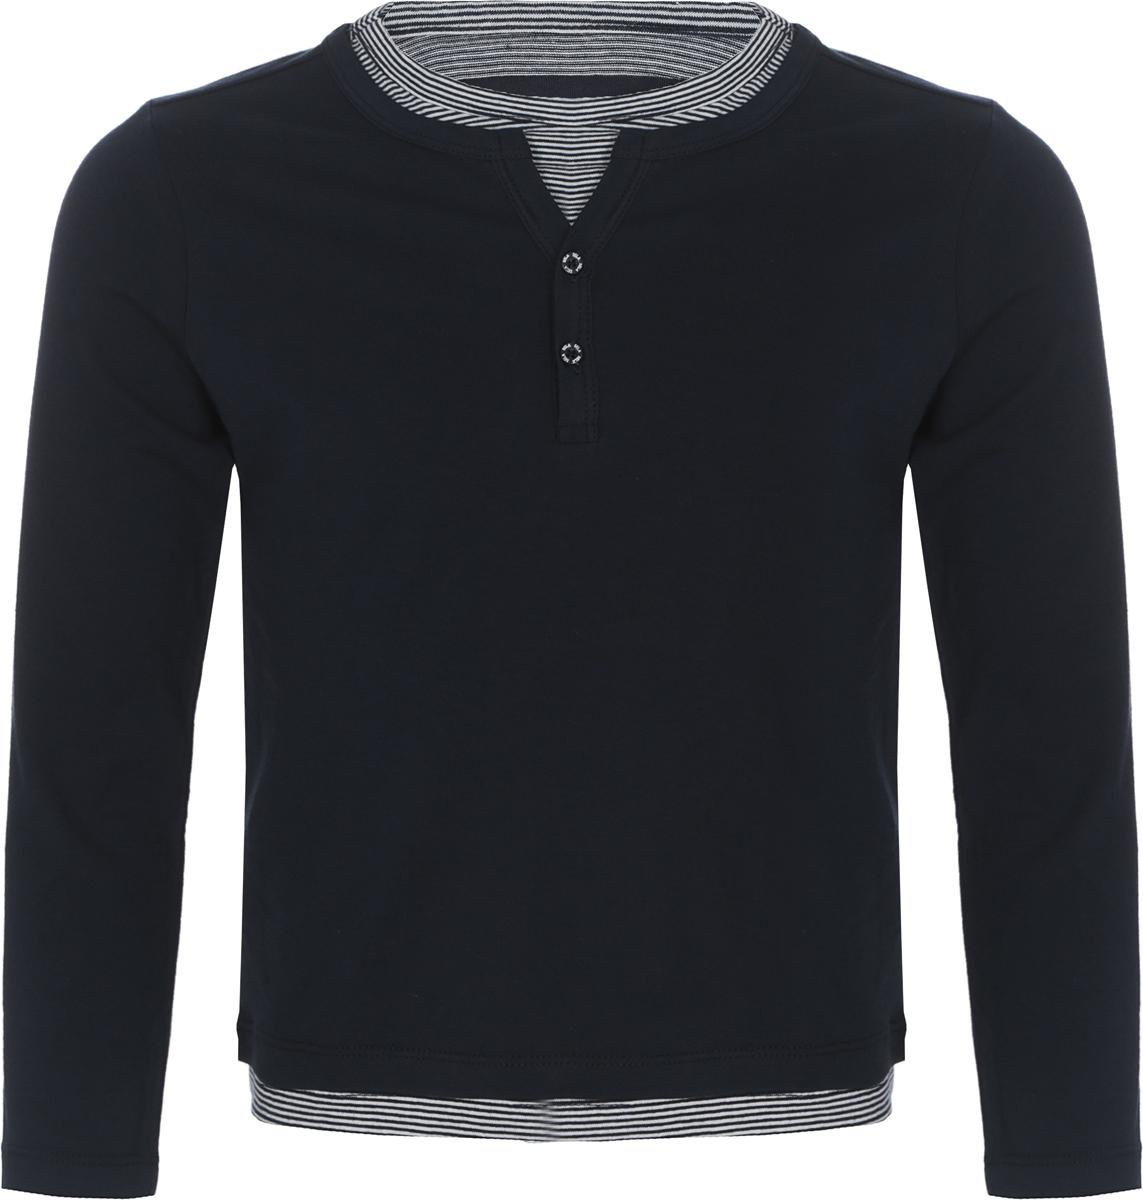 Джемпер для мальчика Sela, цвет: темно-синий. T-711/585-8132. Размер 116, 6 лет цена